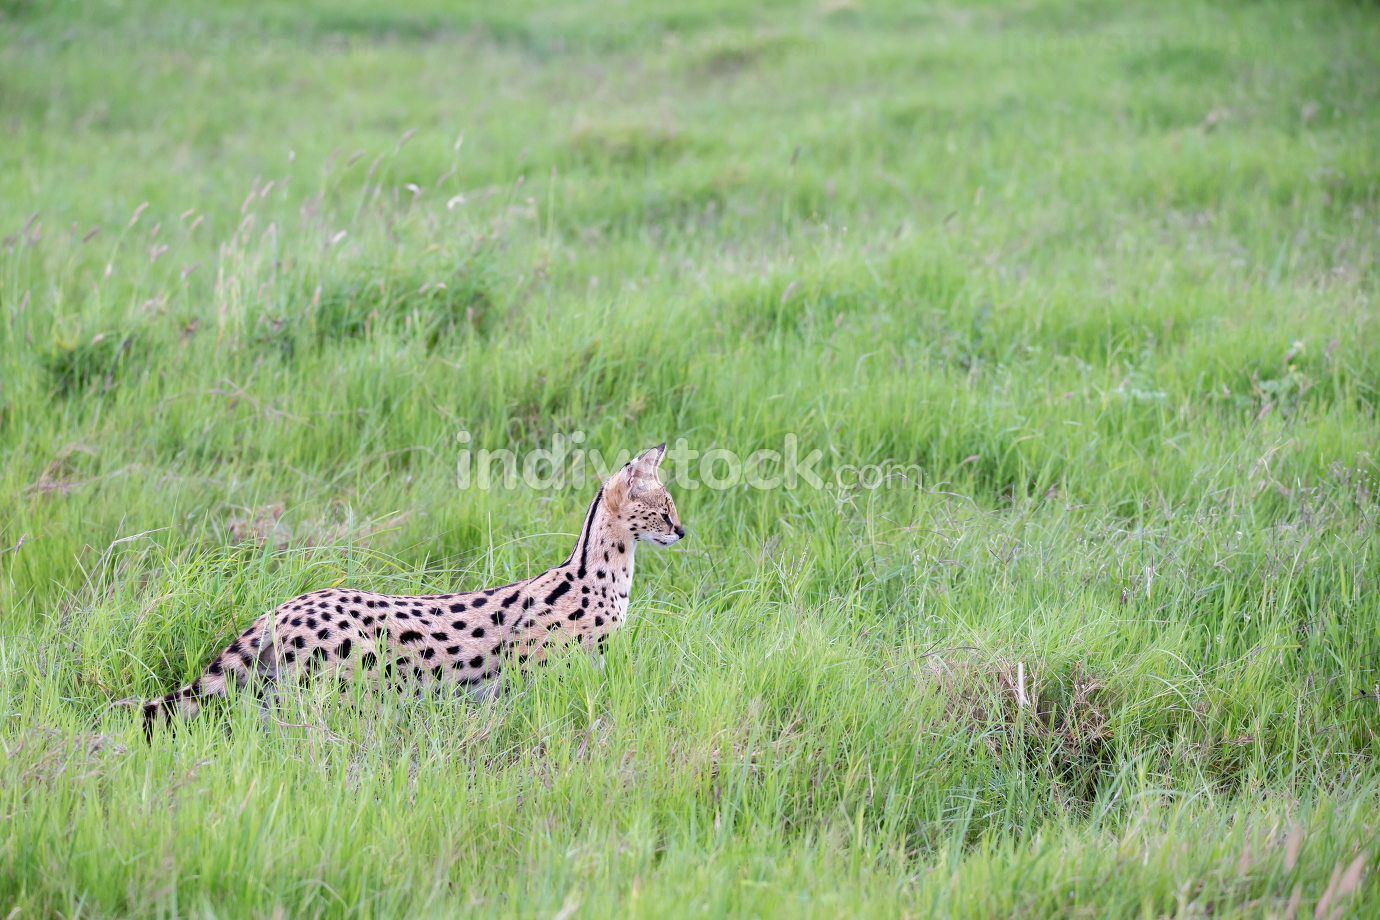 Kenya, a serval cat in the grassland of the savannah in Kenya